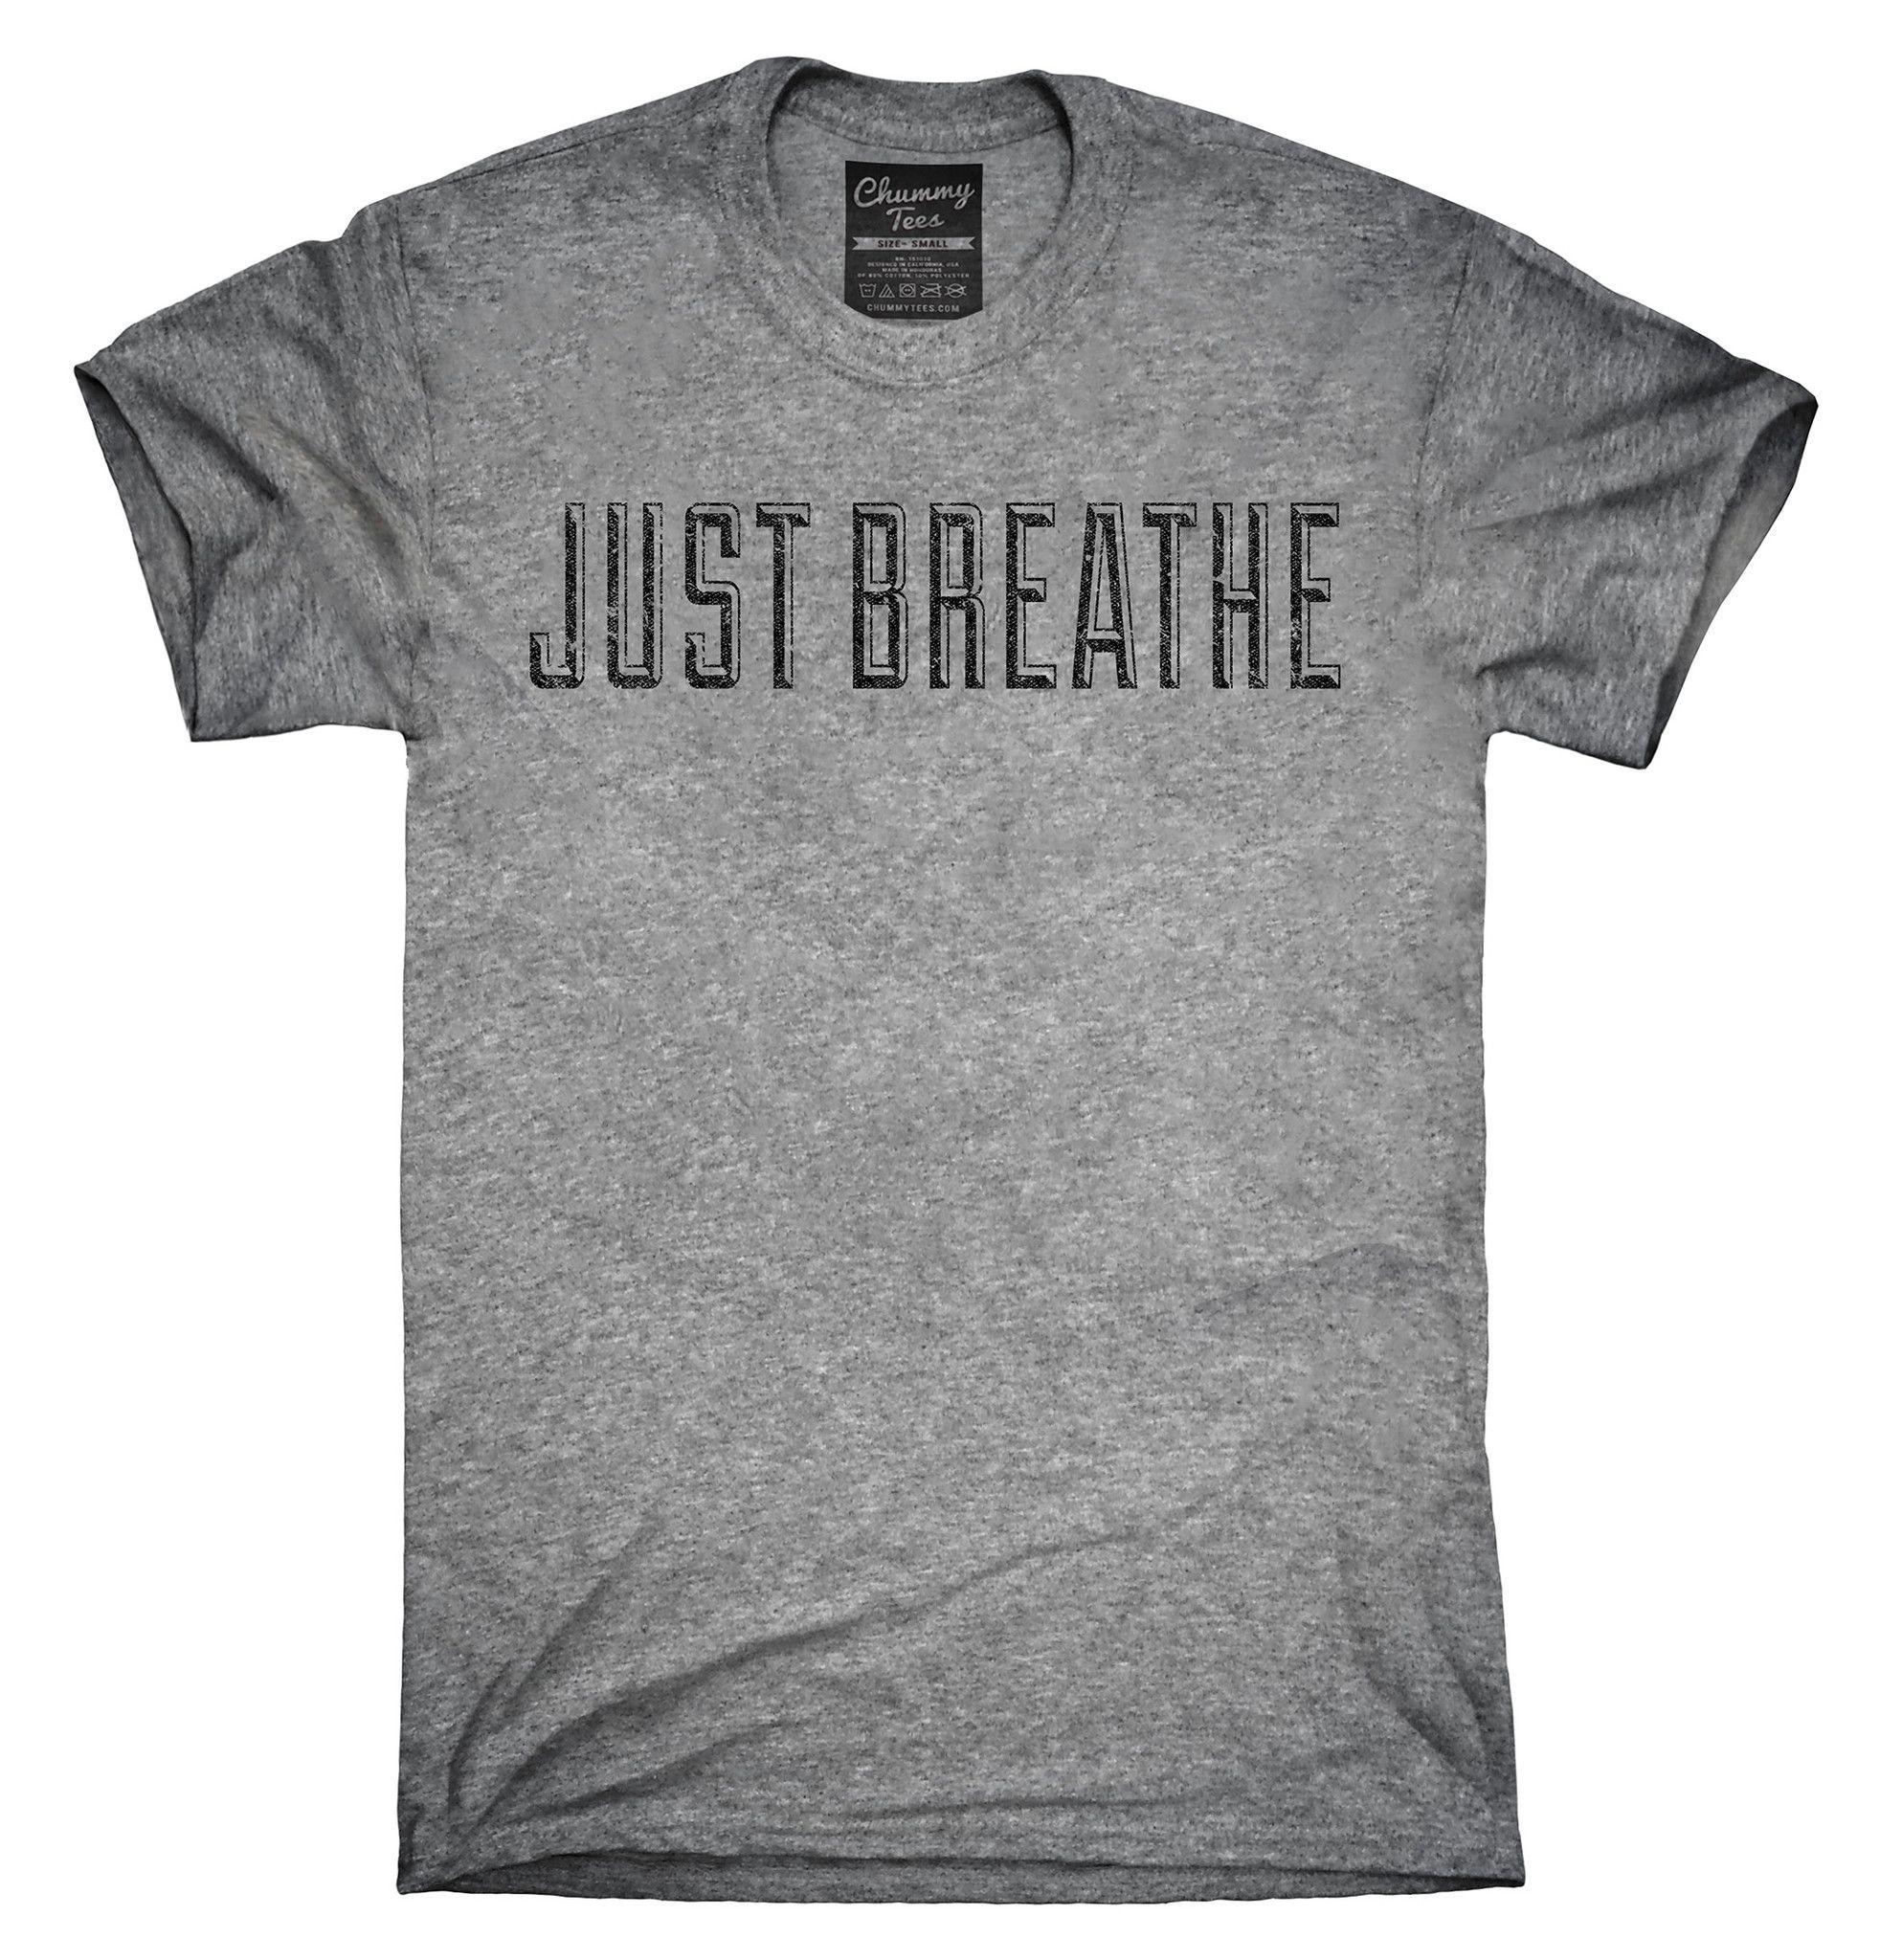 8e3e82855c Just Breathe Shirt, Hoodies, Tanktops   Shert   Pinterest   Póló ...